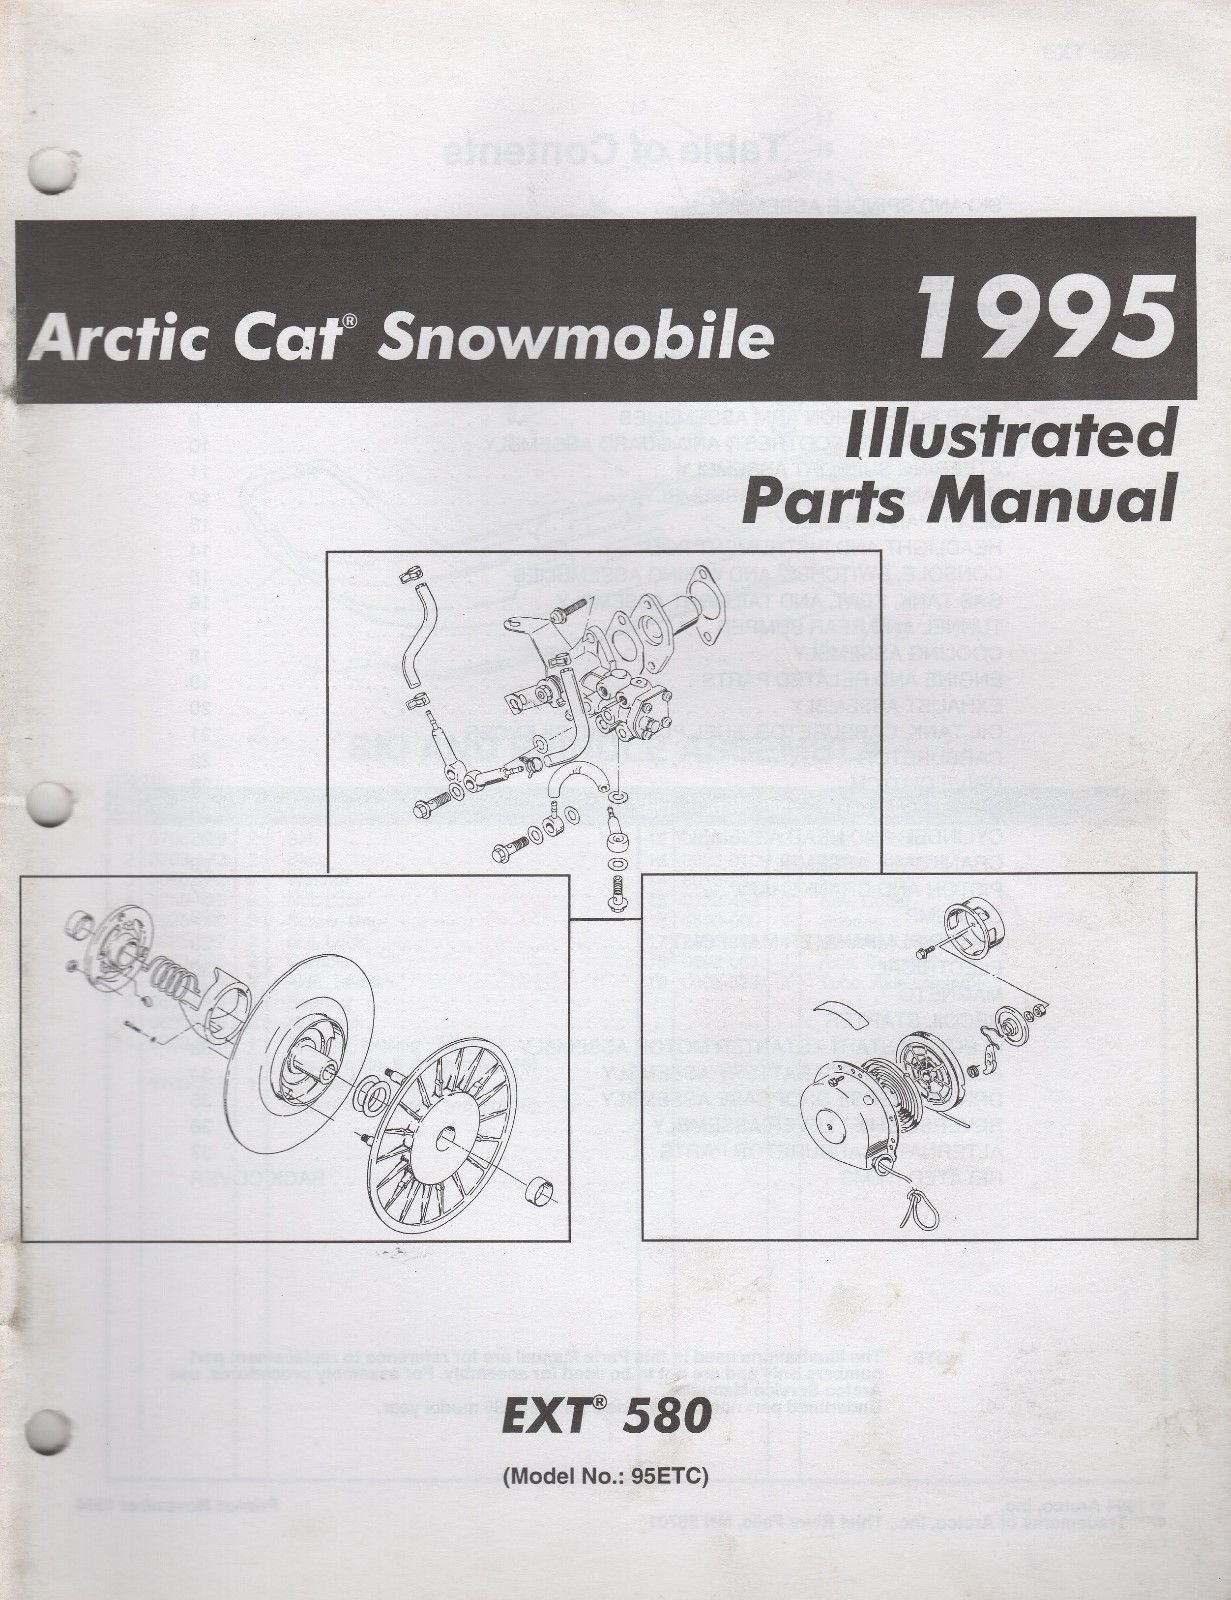 1995 ARCTIC CAT SNOWMOBILE EXT 580 PARTS MANUAL P/N 2255-154 (748)  Paperback – 1995